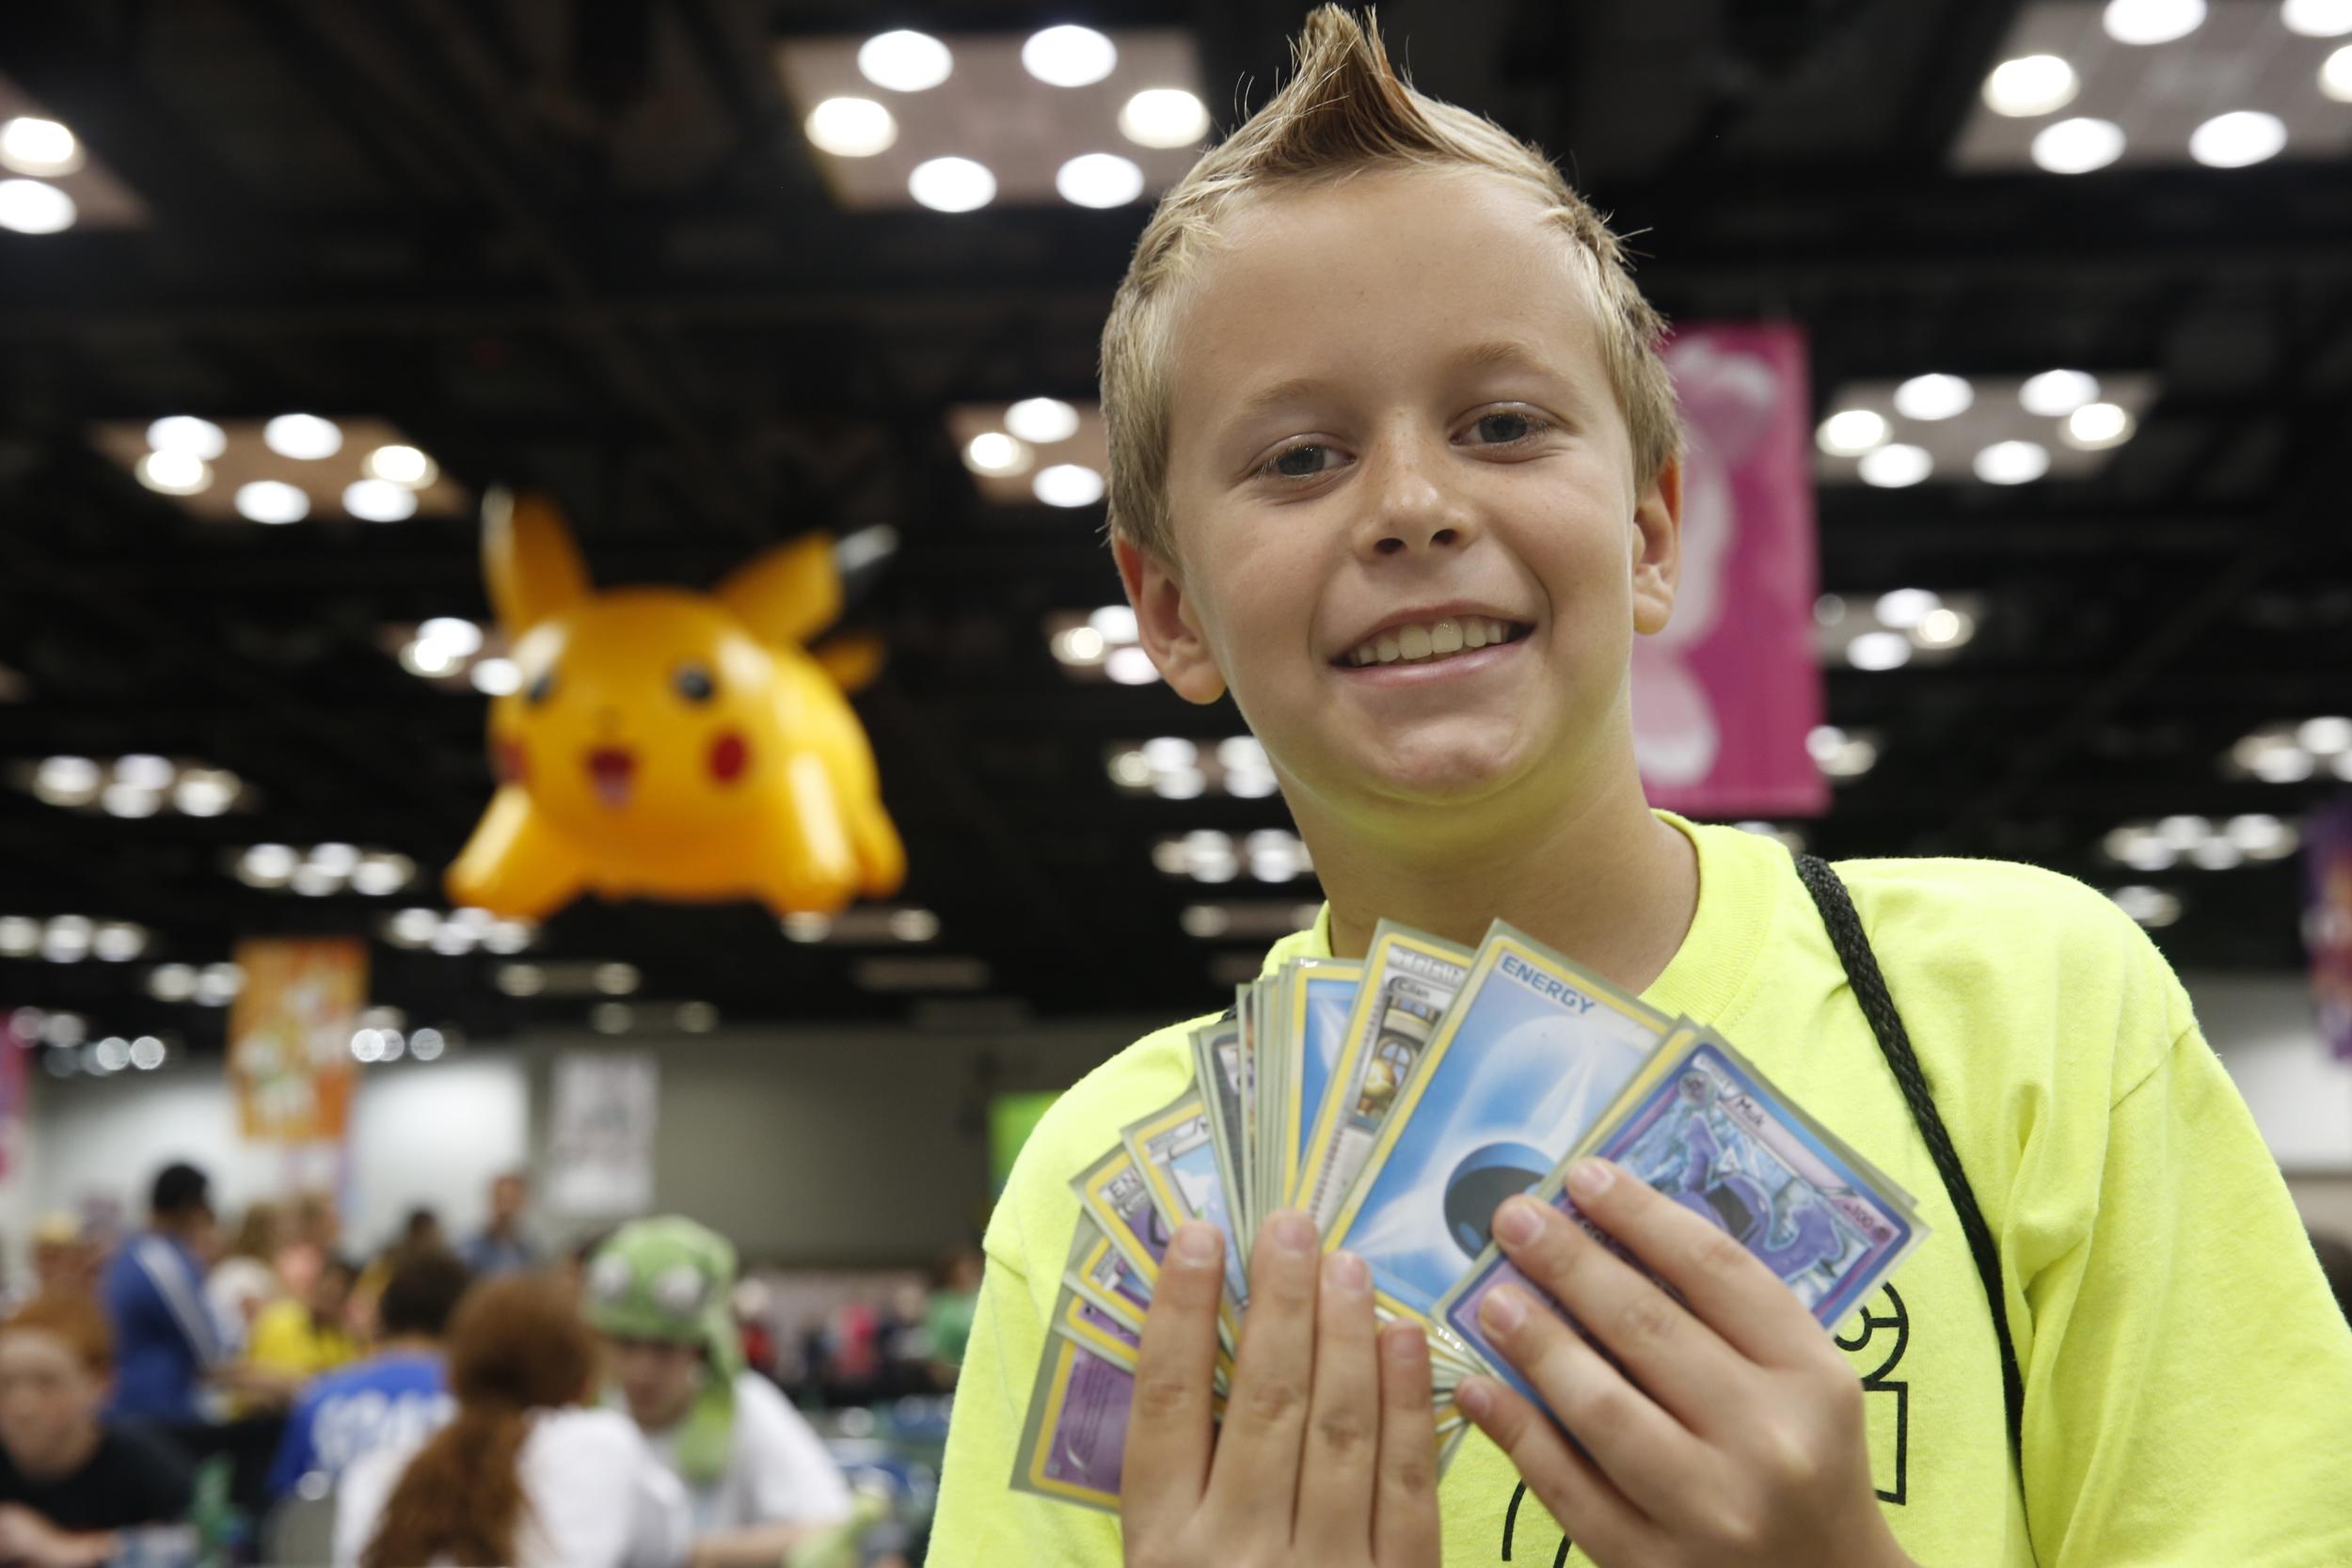 2013 U.S. Pokémon National Championships Image 6.JPG